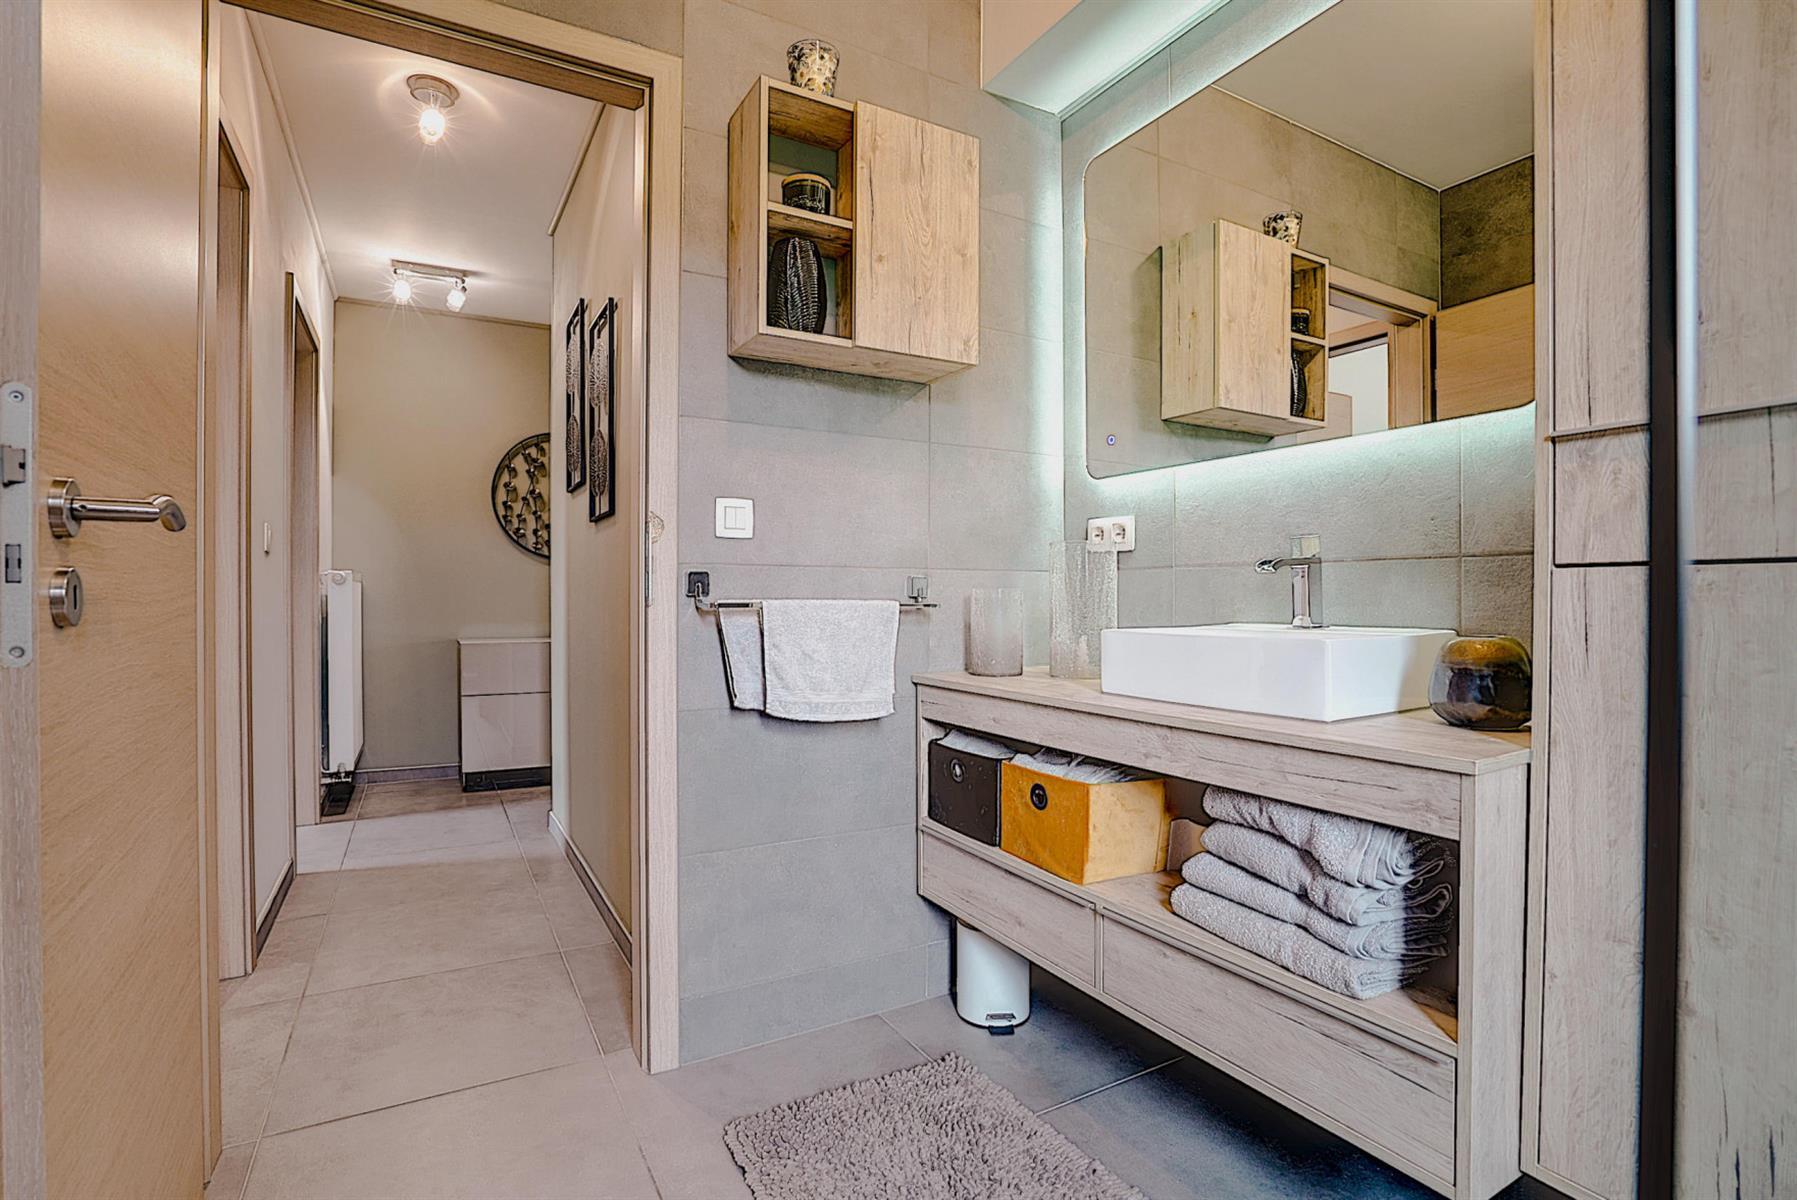 Appartement - Grâce-hollogne - #4364483-10